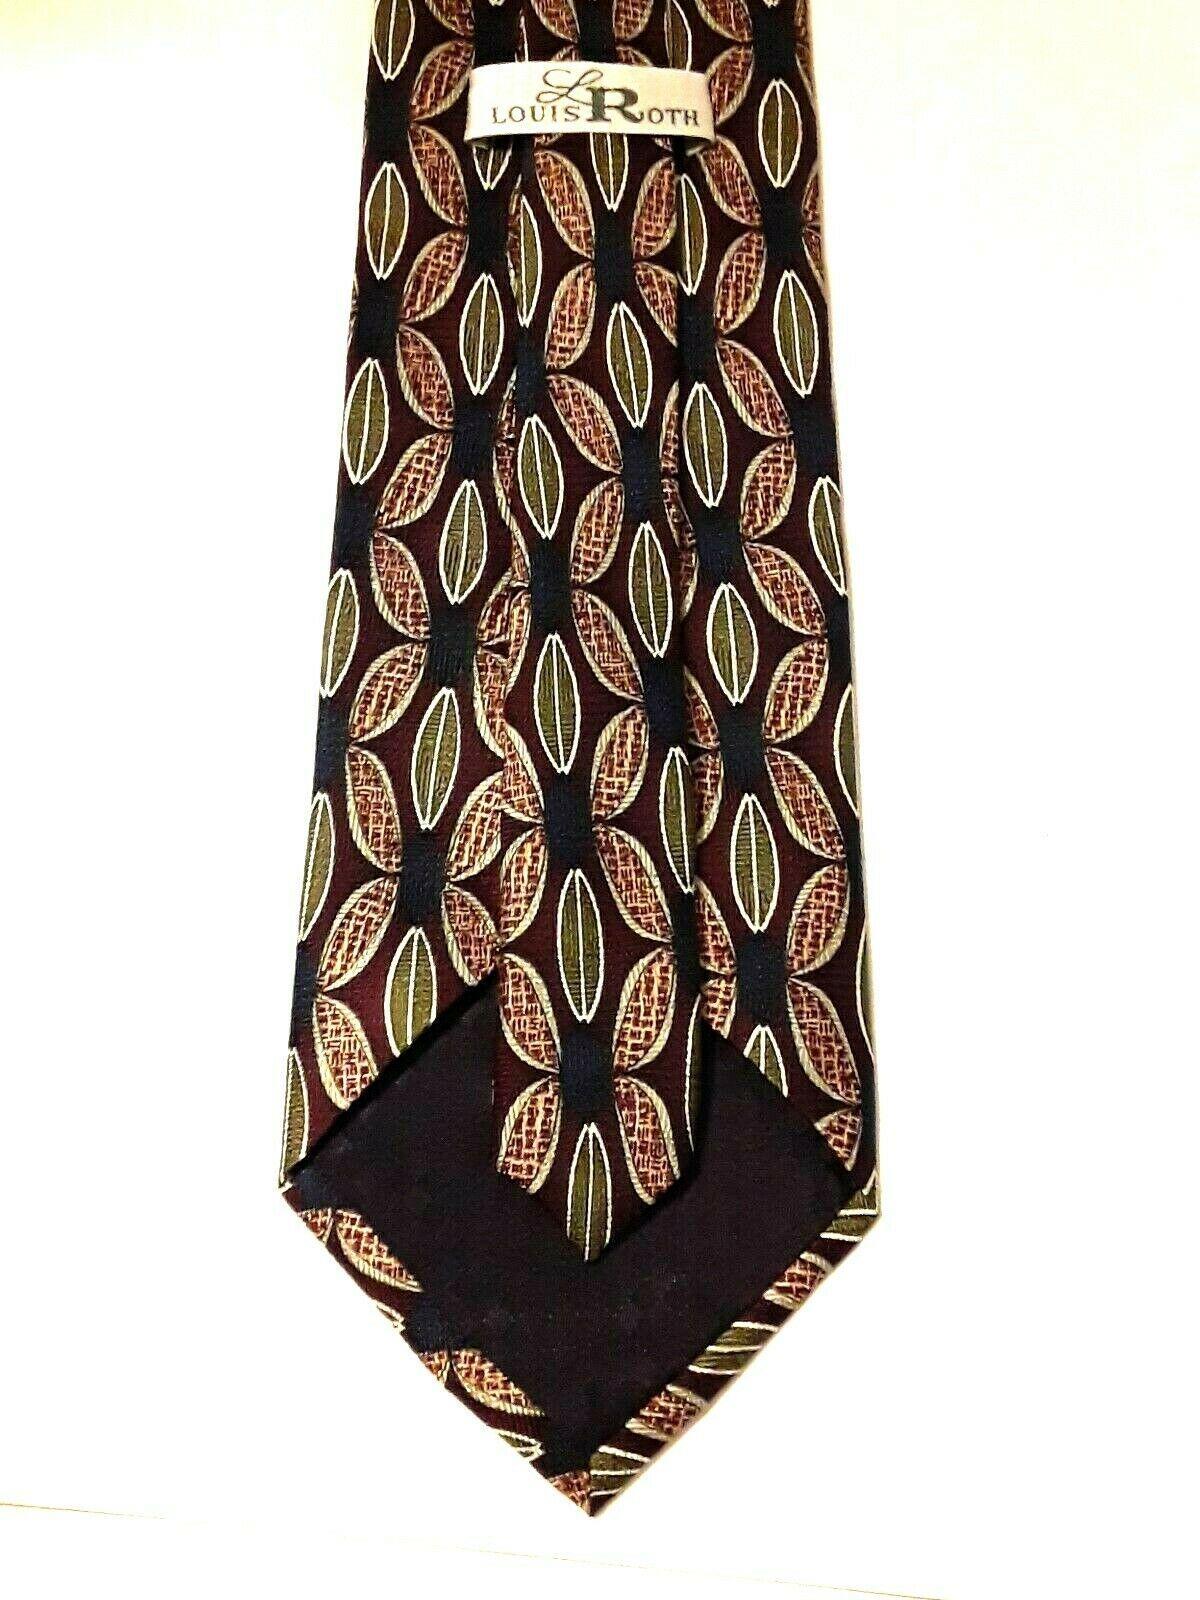 "Louis Roth Men's Tie Necktie 100% Silk Gold Black Burgundy Geometric 59"" x 4"" image 3"